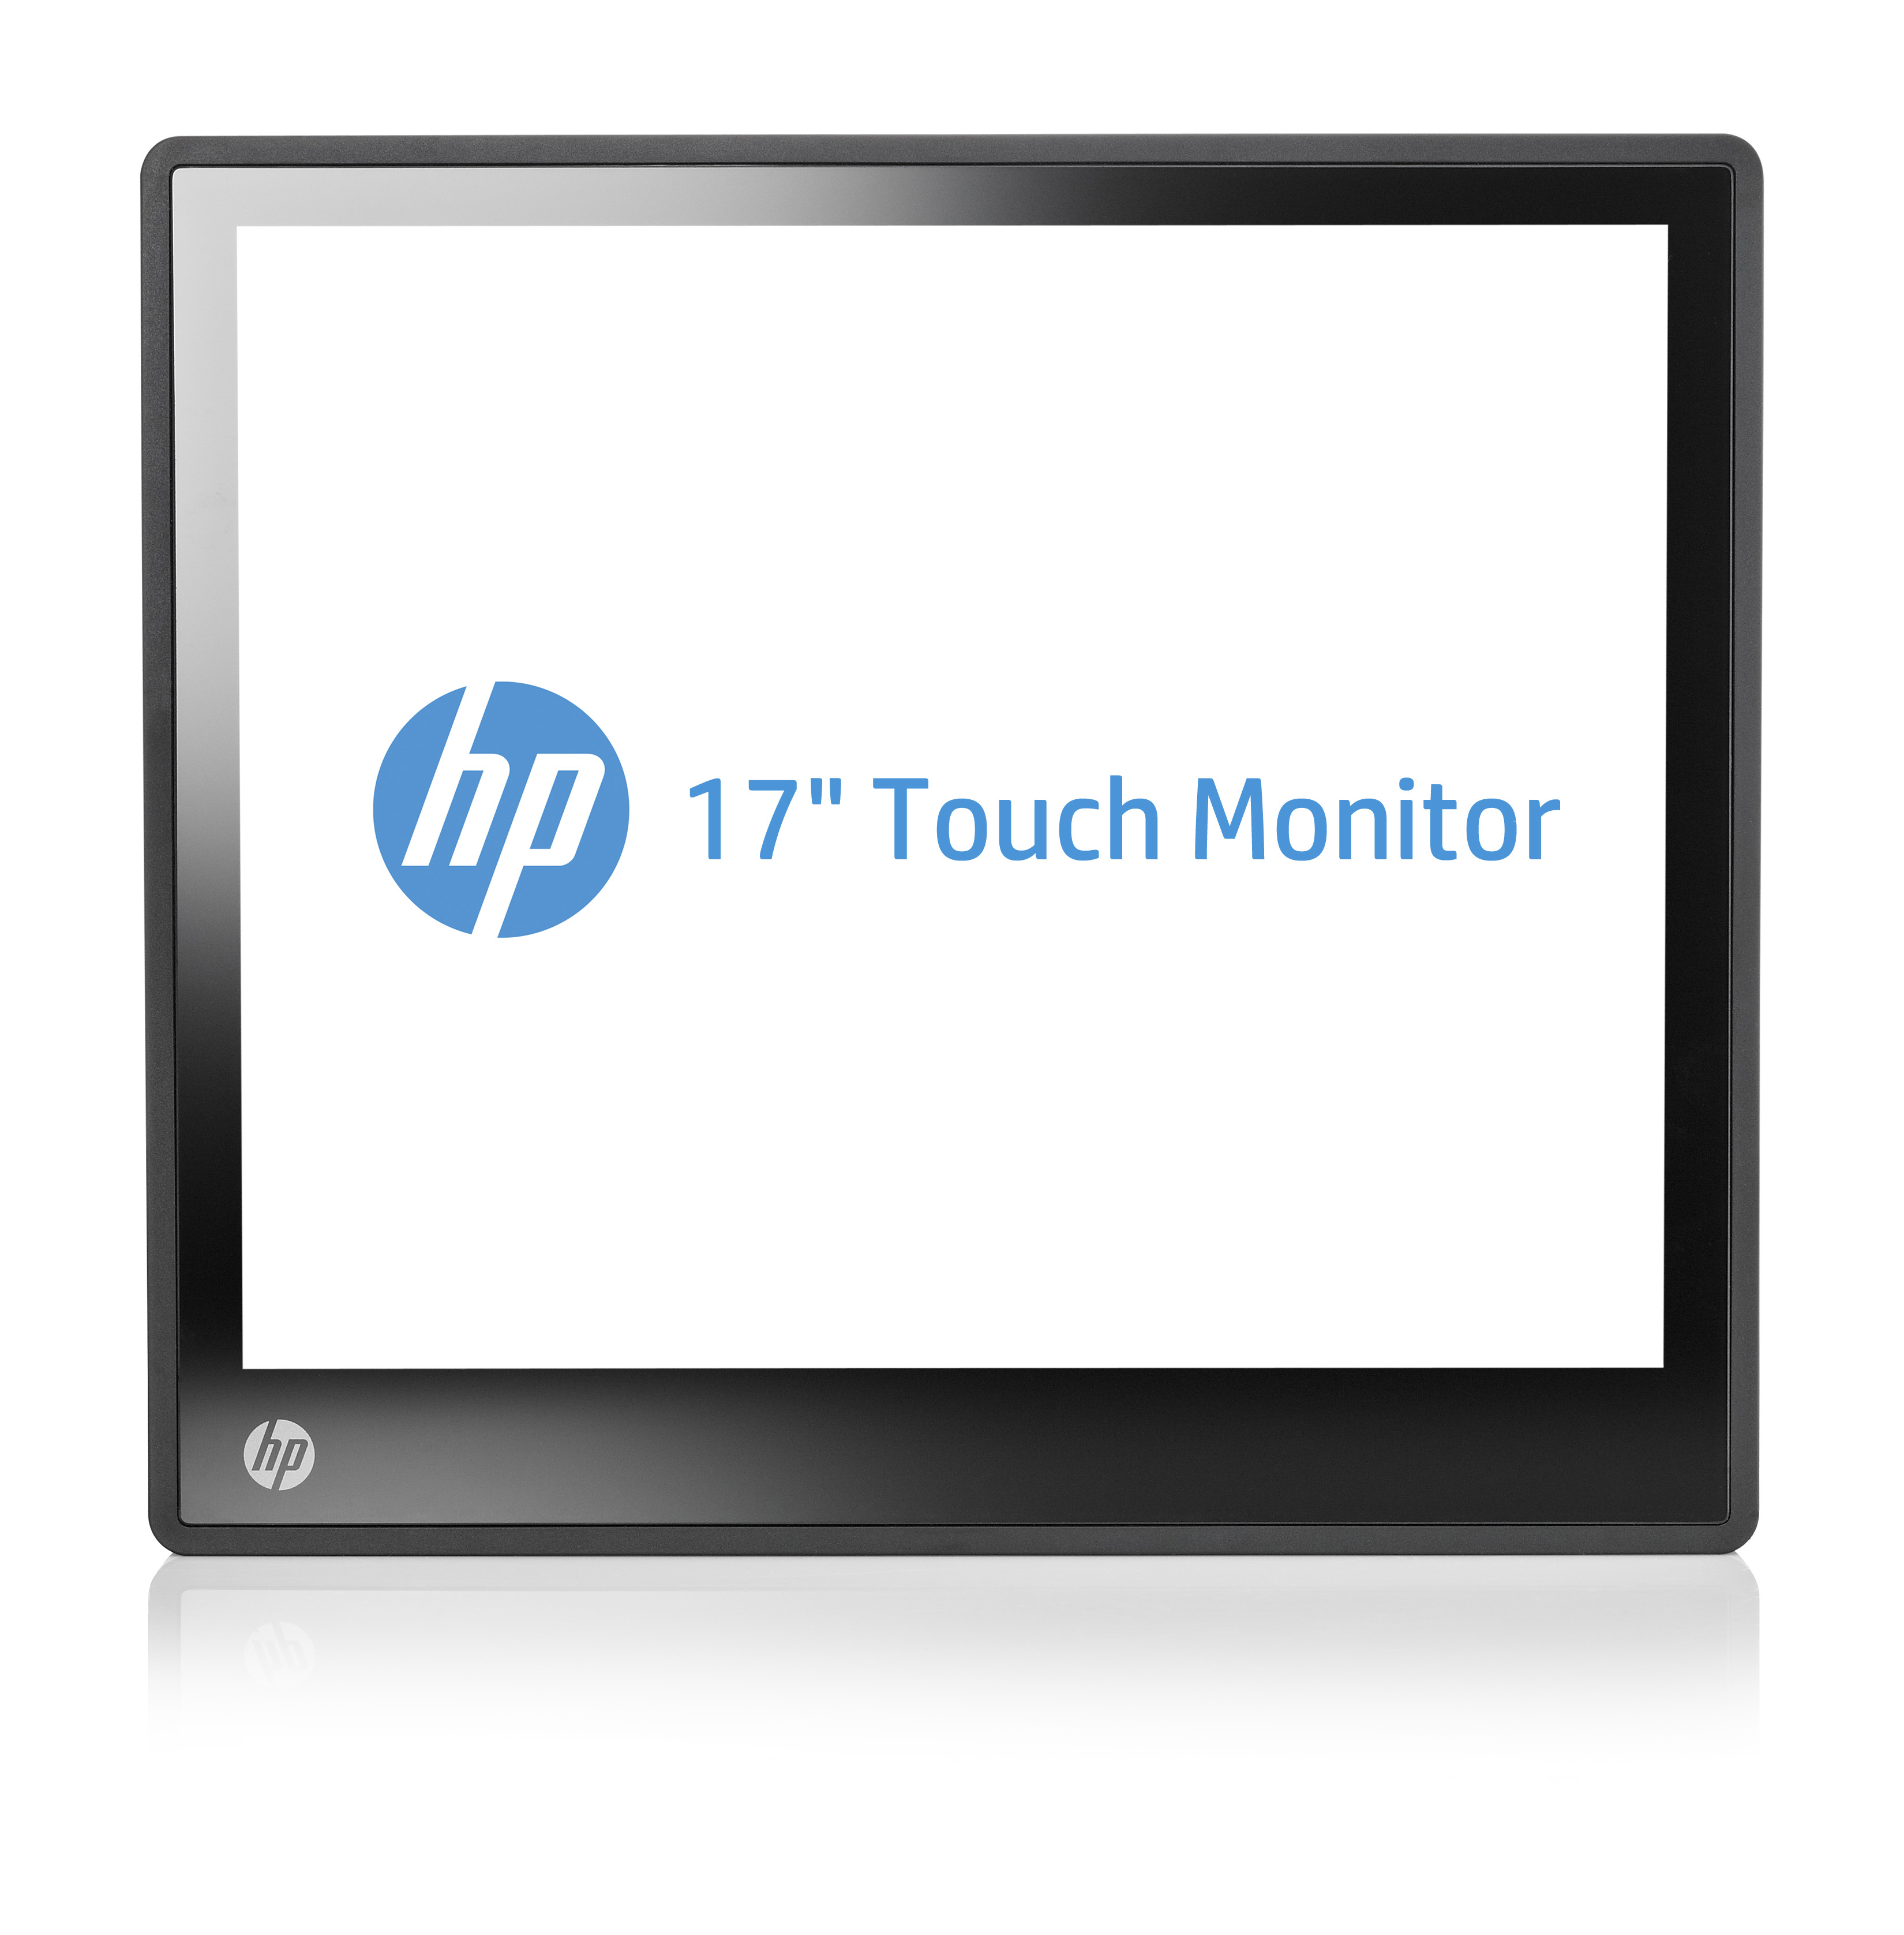 HP L6017tm 17 Zoll Einzelhandels-Touchscreen-Monitor